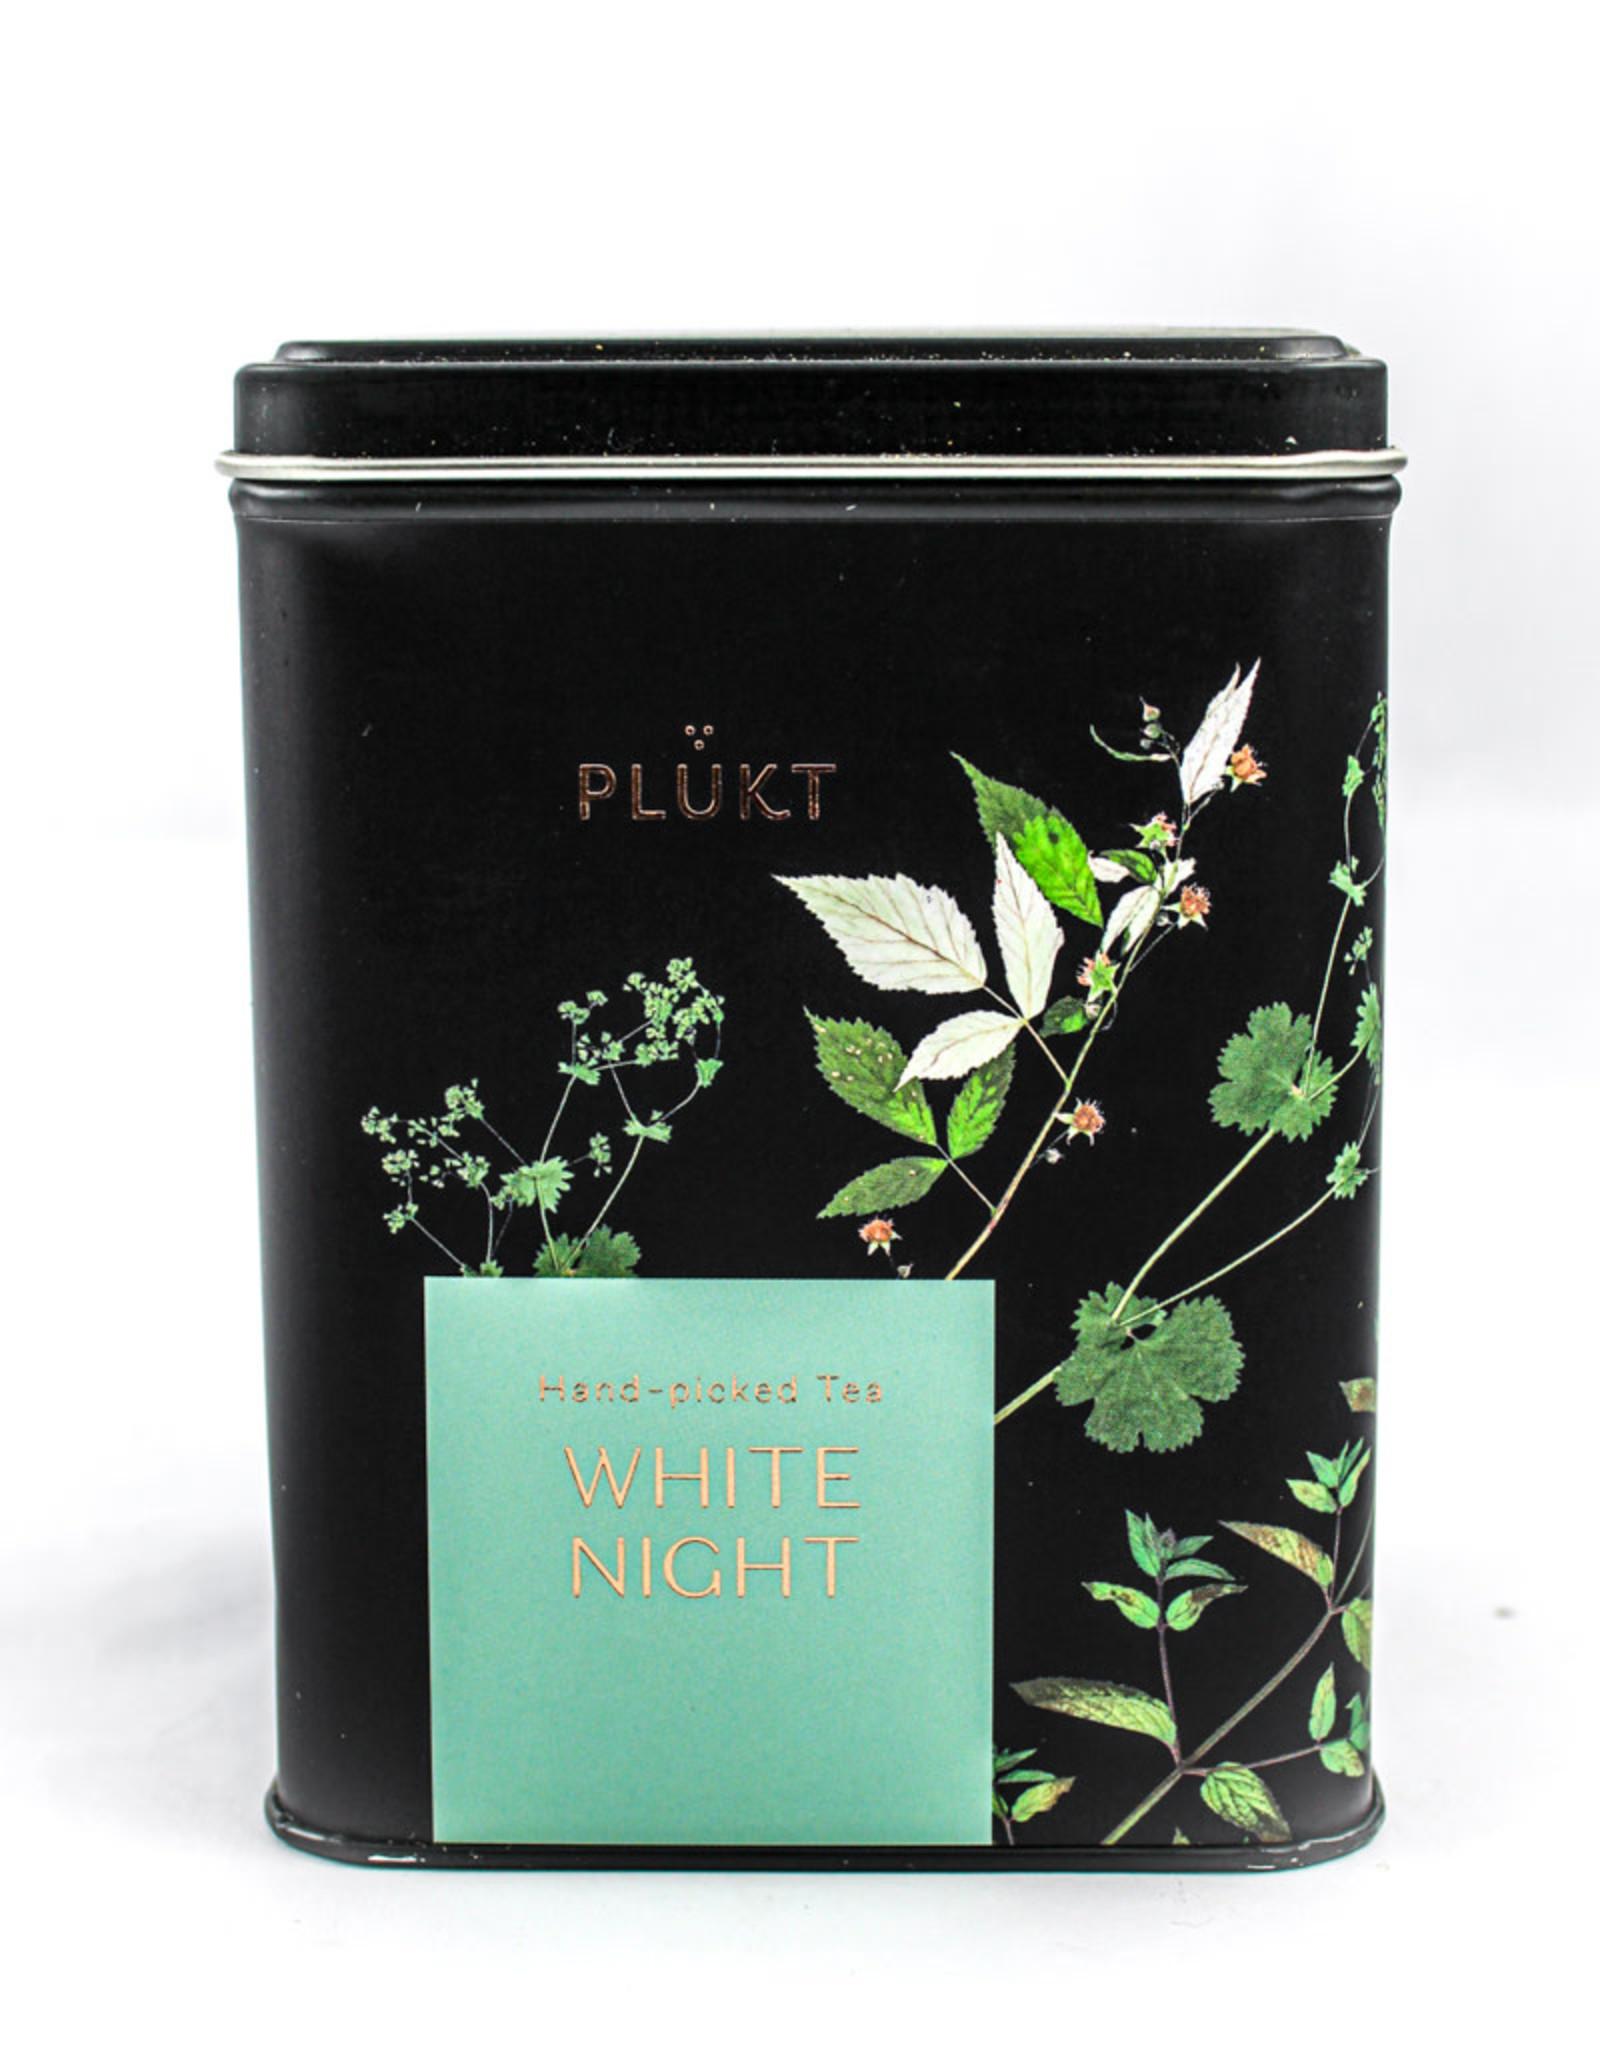 Plukt White Night Evening Tea